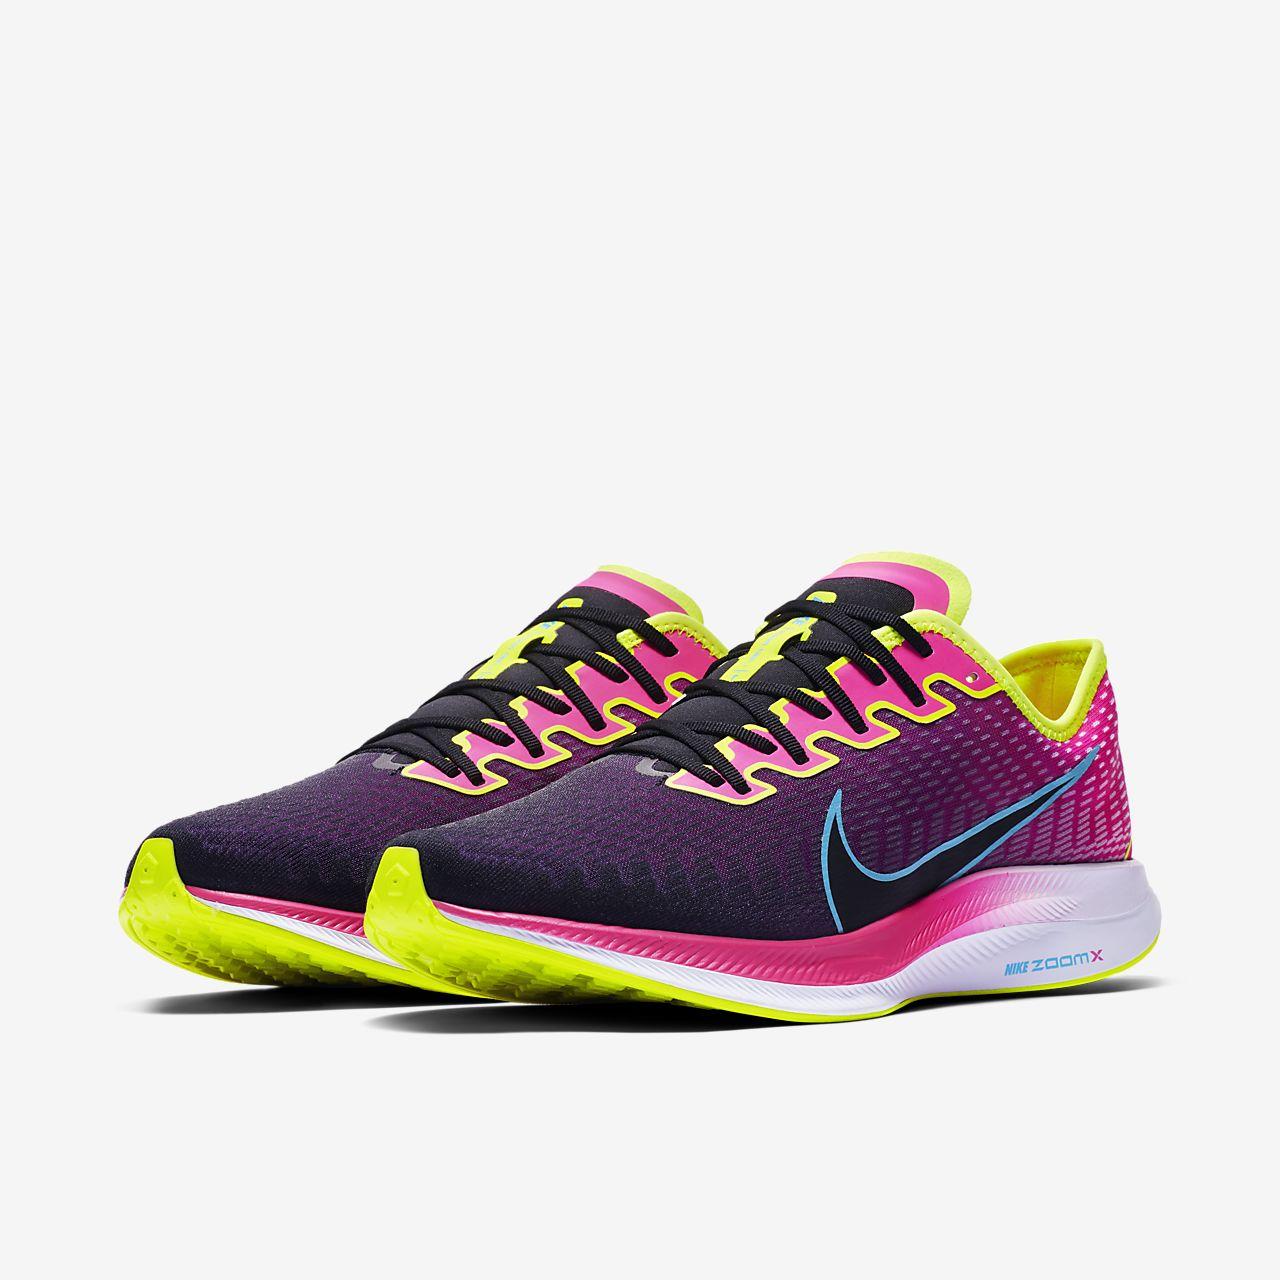 2020 Nike Zoom Pegasus Turbo 2